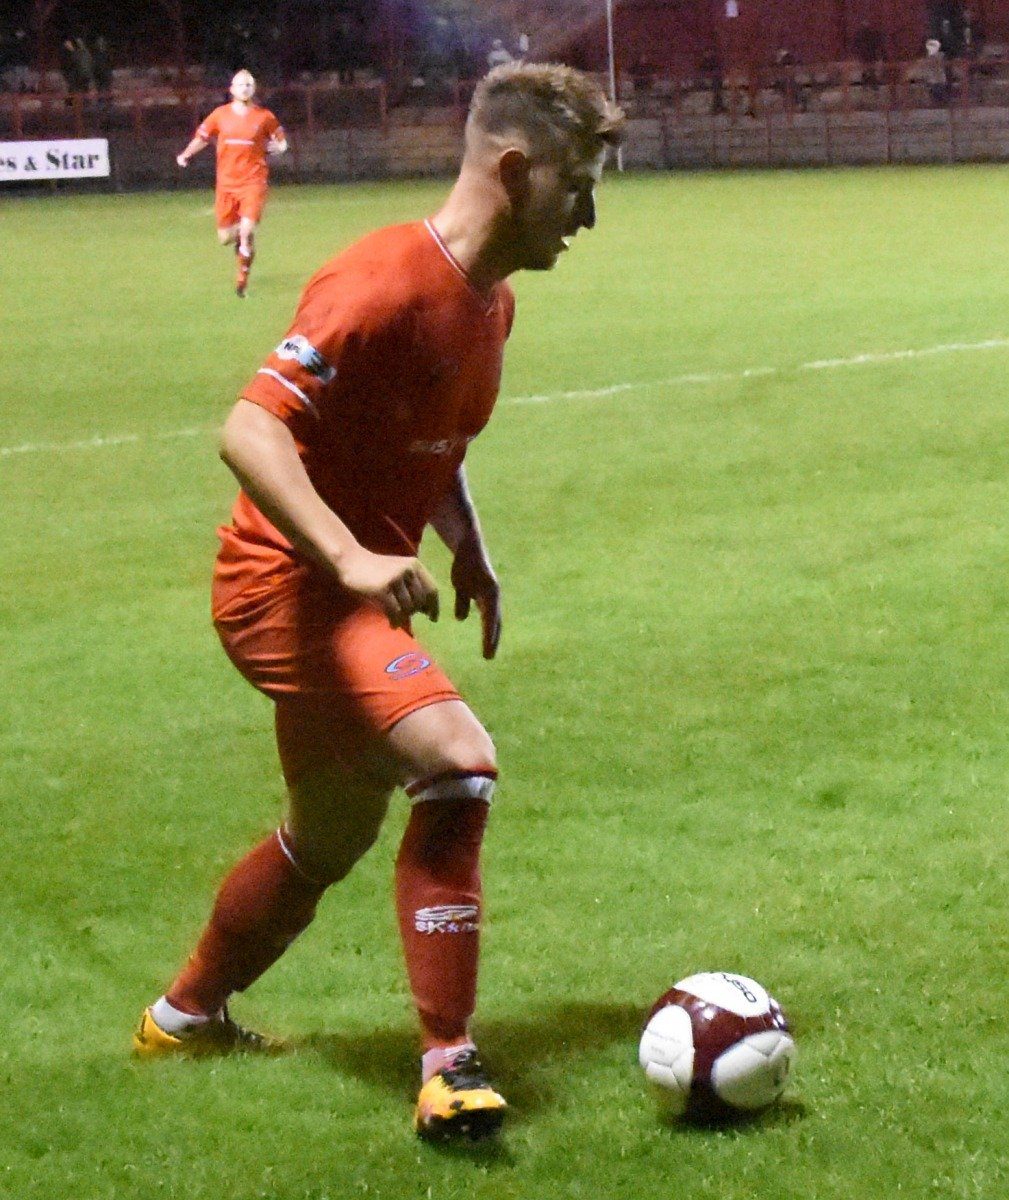 Dav-Symington-was-Man-Of-The-Match-for-Workington-RedsBen-Chalis